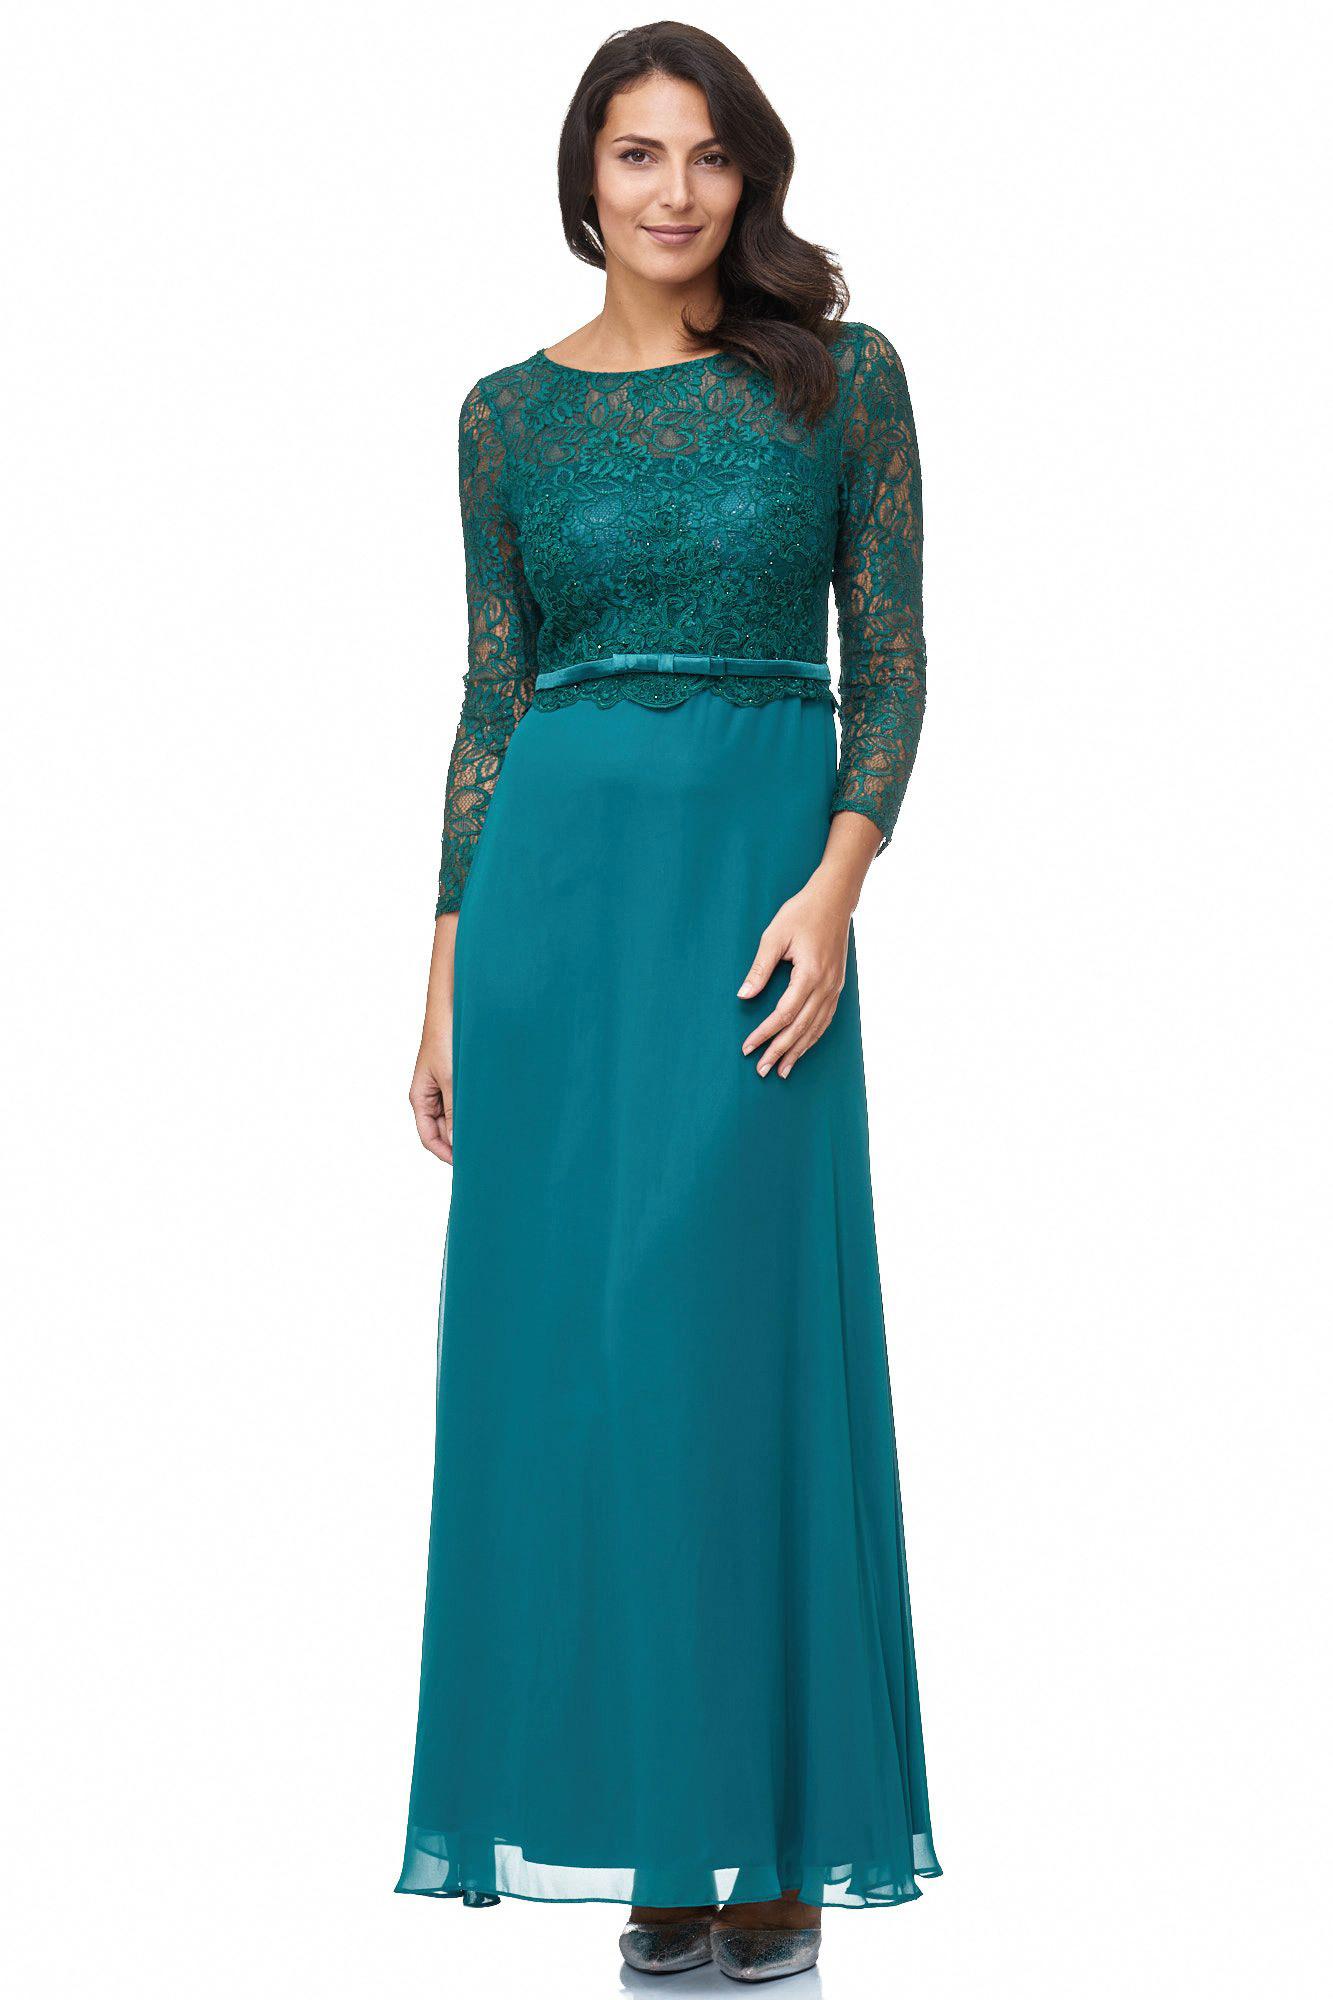 20 Top Abendkleid In Übergröße Design10 Genial Abendkleid In Übergröße Stylish